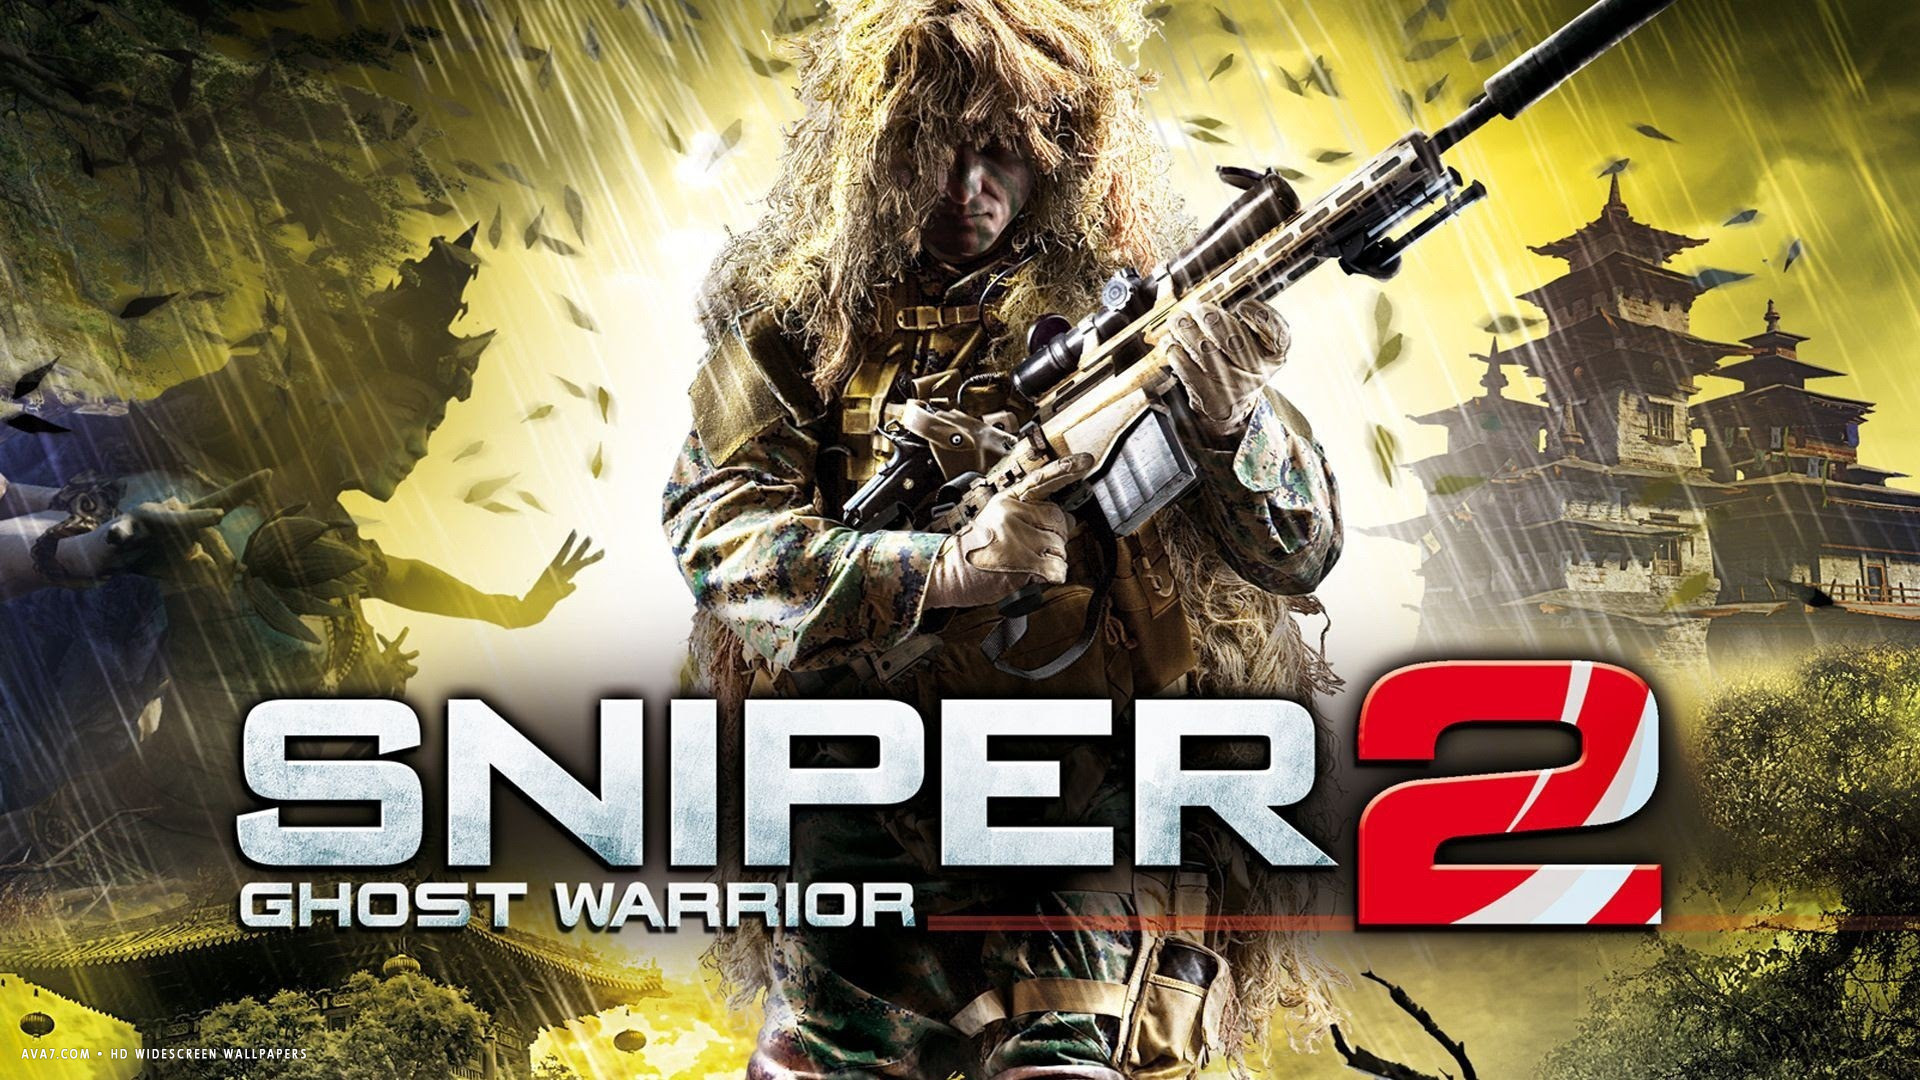 Sniper Ghost Warrior 2 Game Hd Widescreen Wallpaper Games